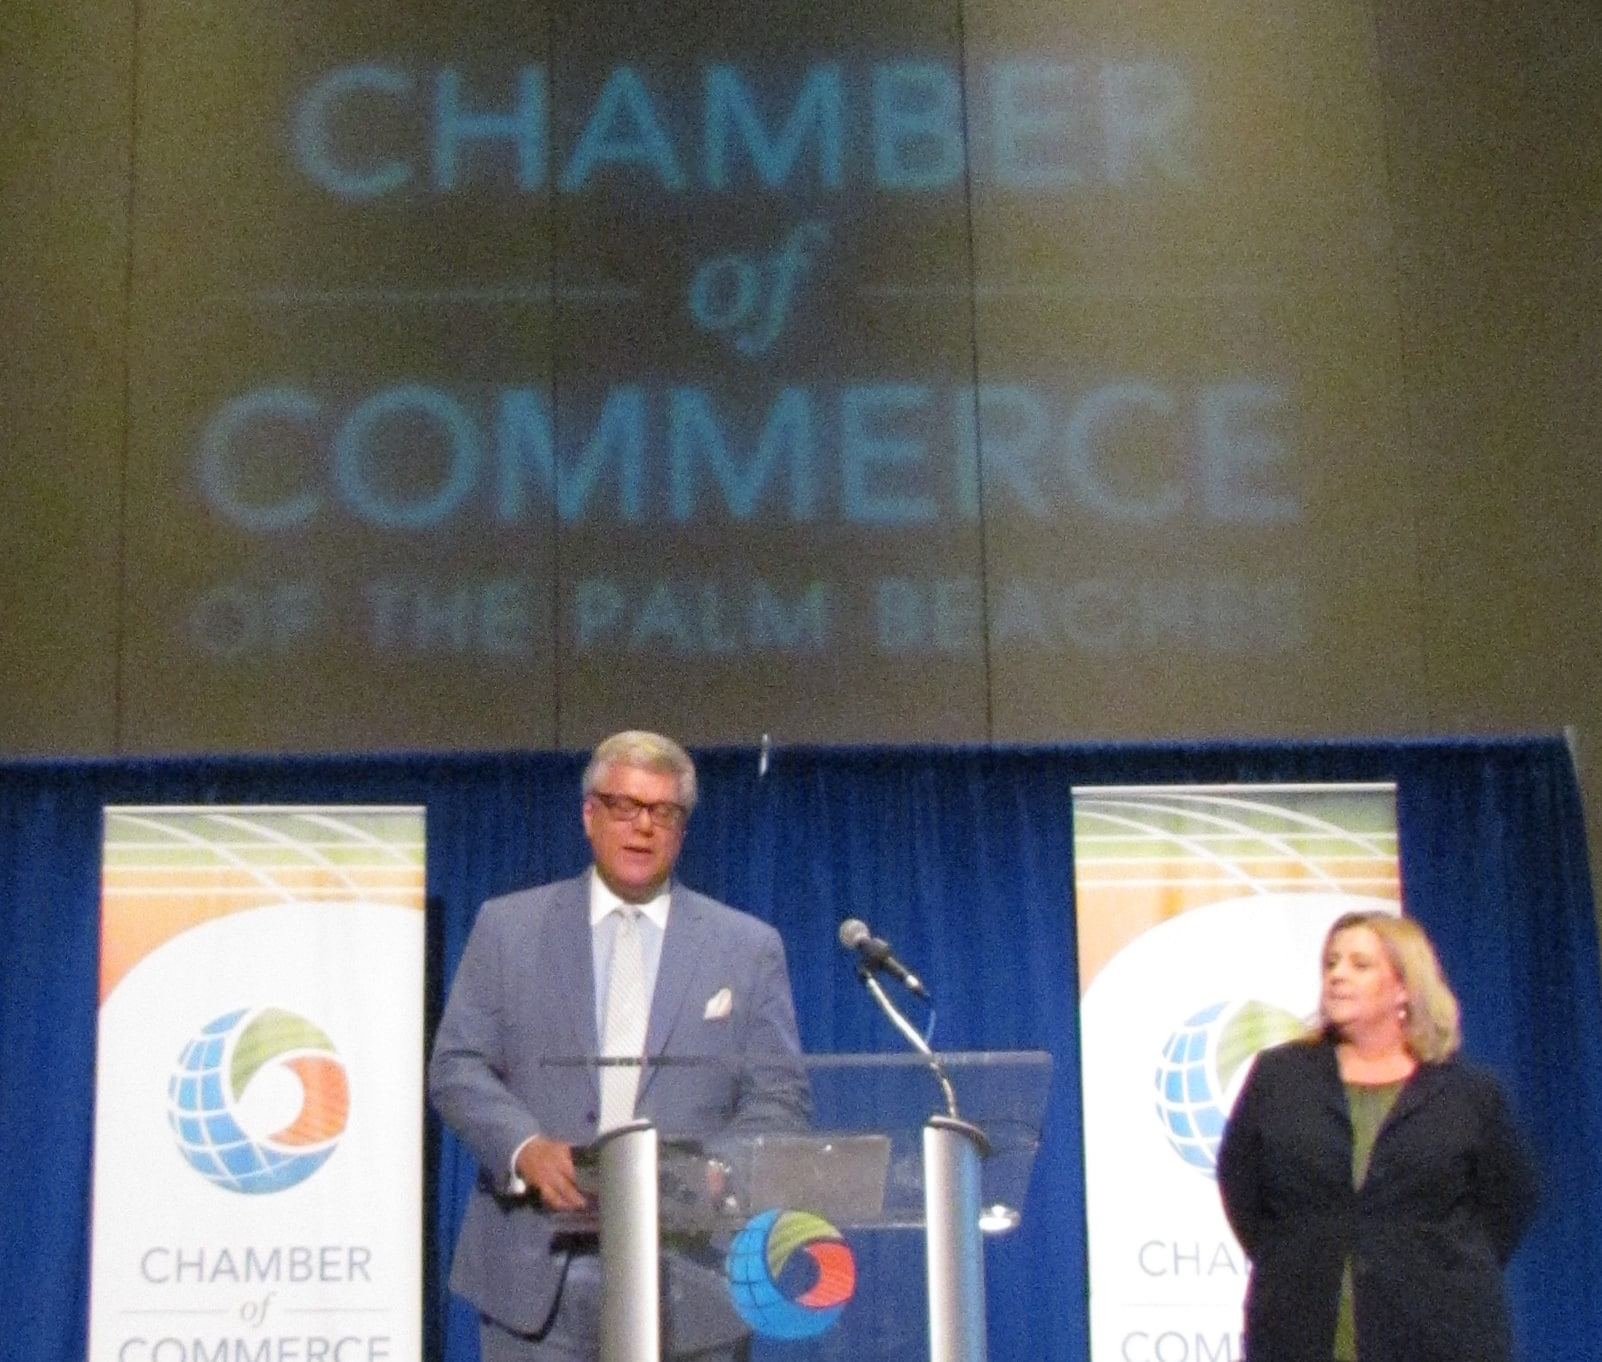 Keiser University Presidents Share Insight at Annual Chamber Breakfast